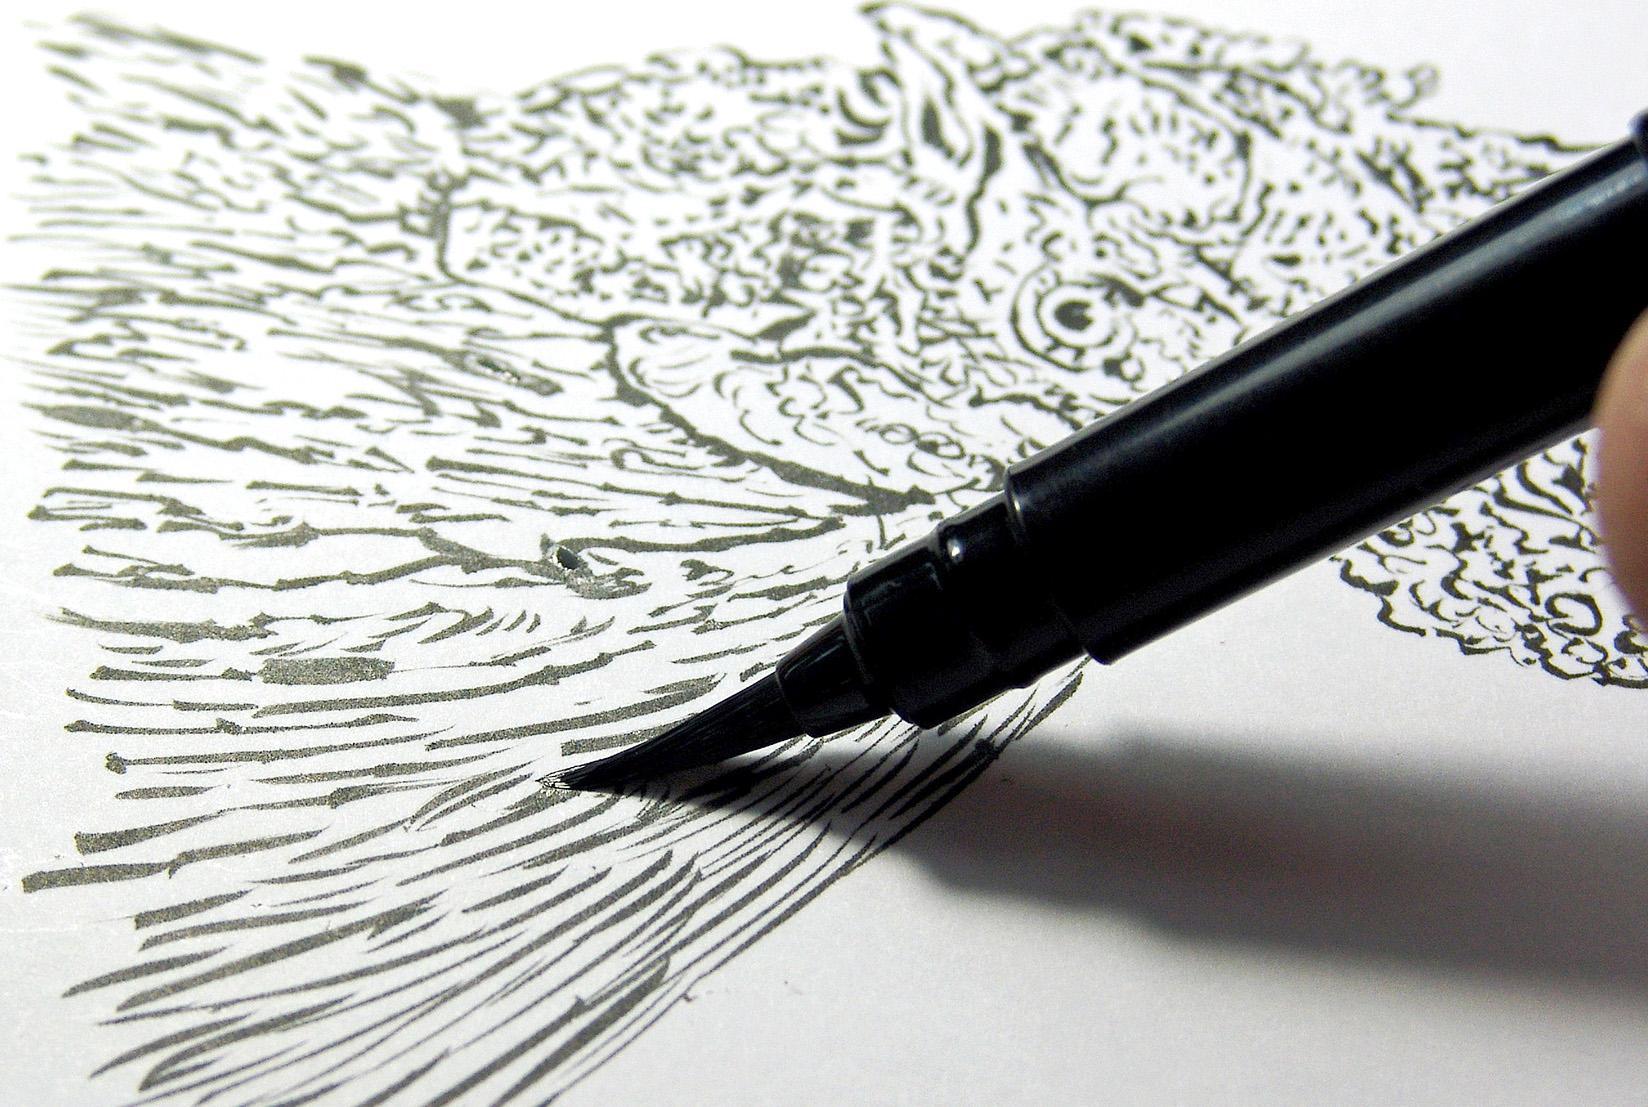 Pentel Arts Pocket Brush Pen With Refills 1 Pen 2